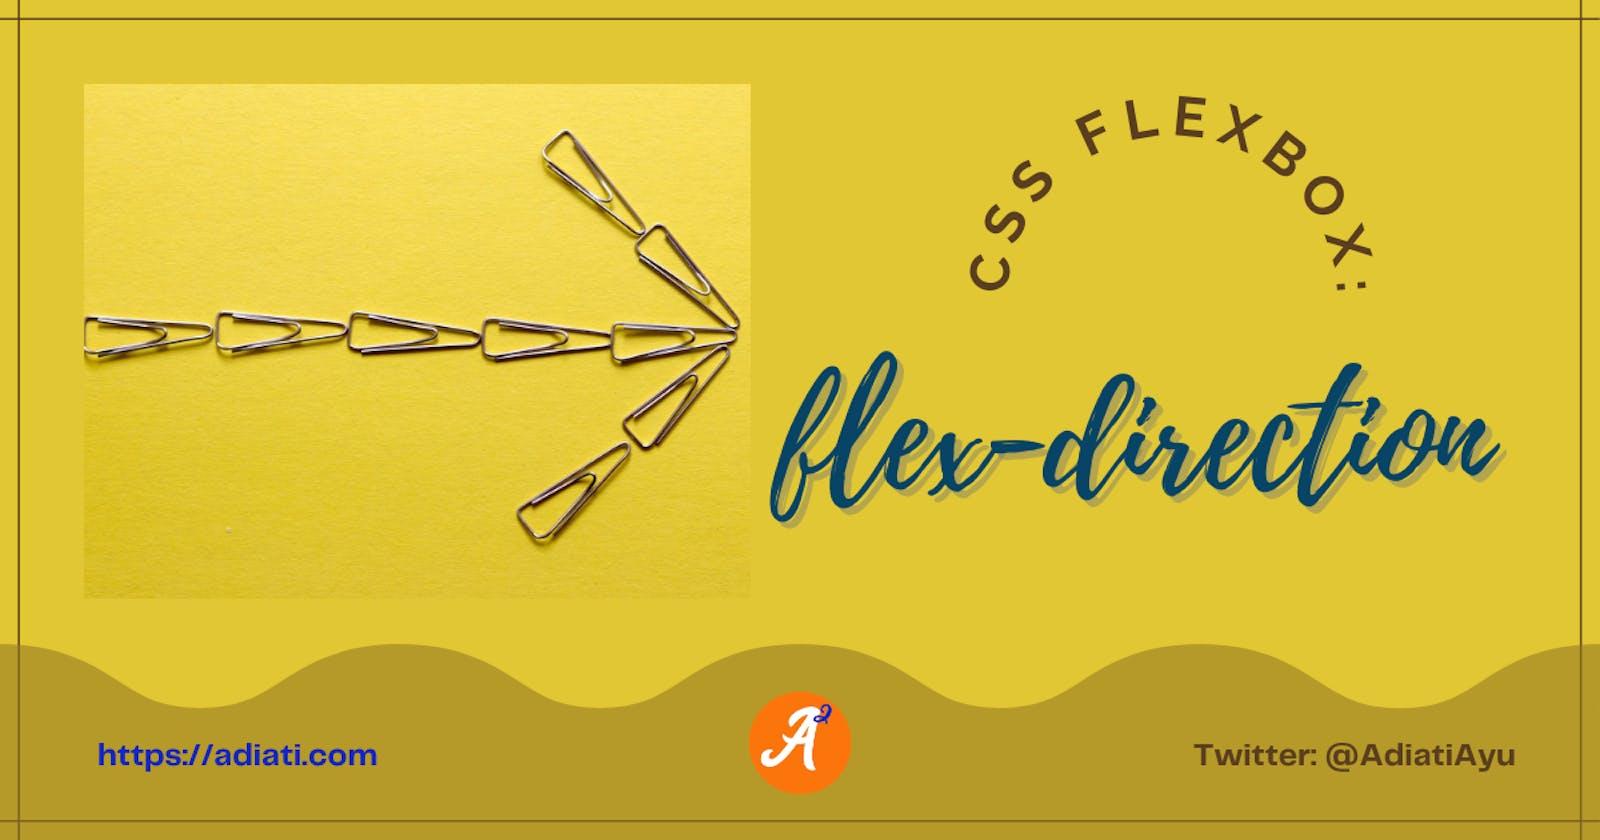 CSS Flexbox: flex-direction